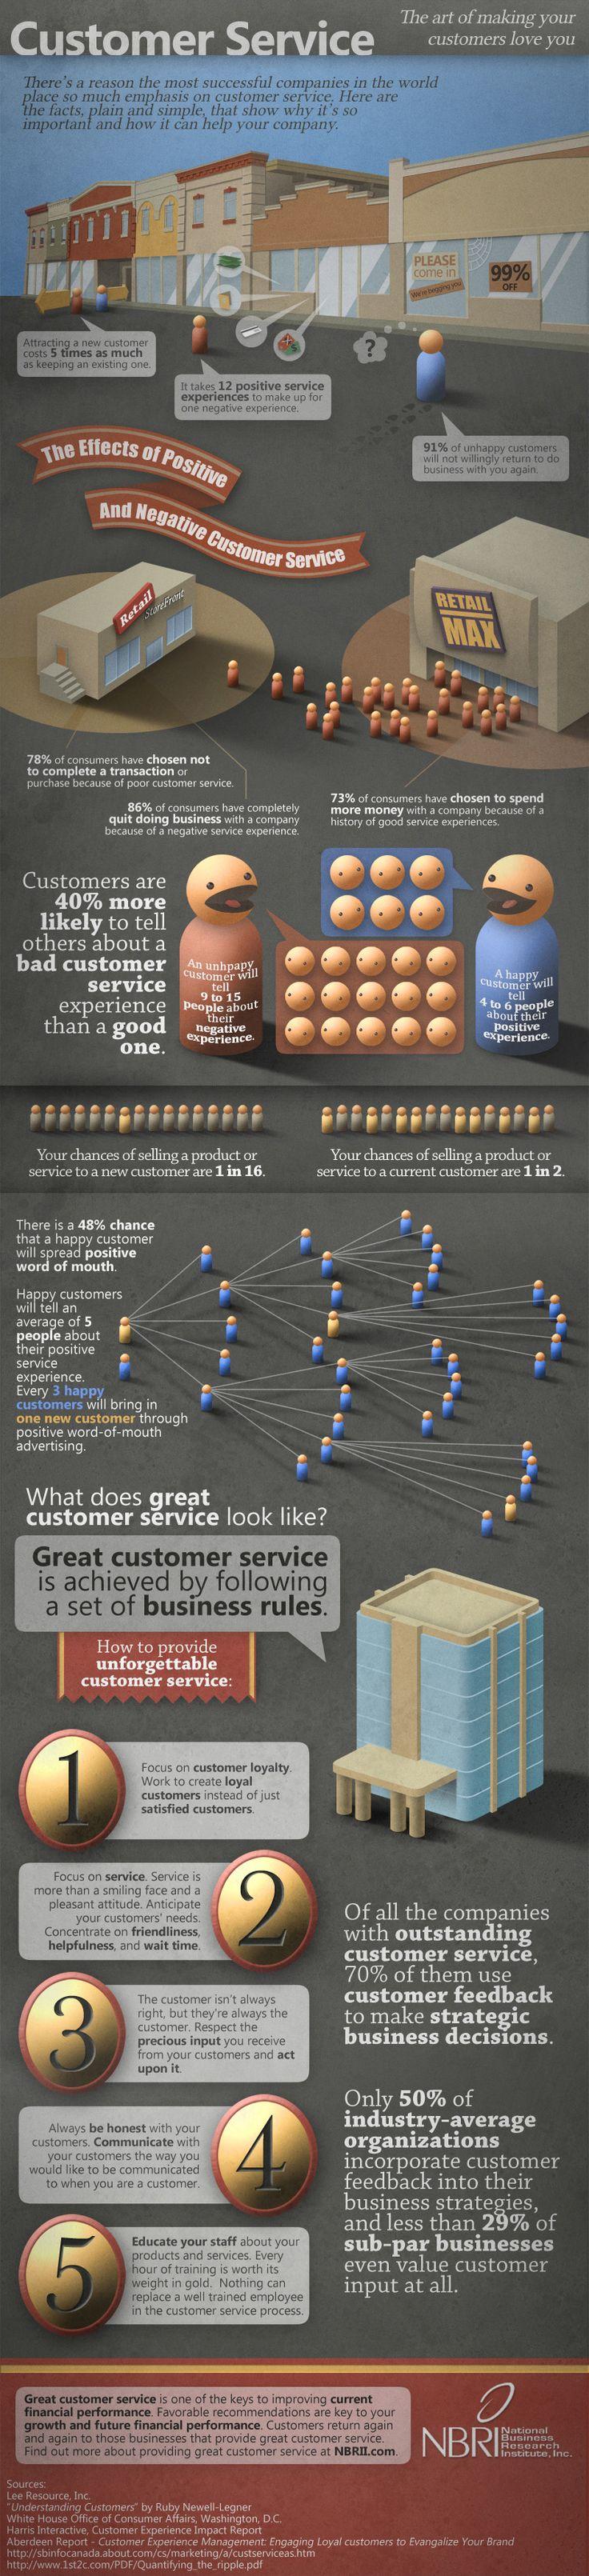 Infographic - Customer Service